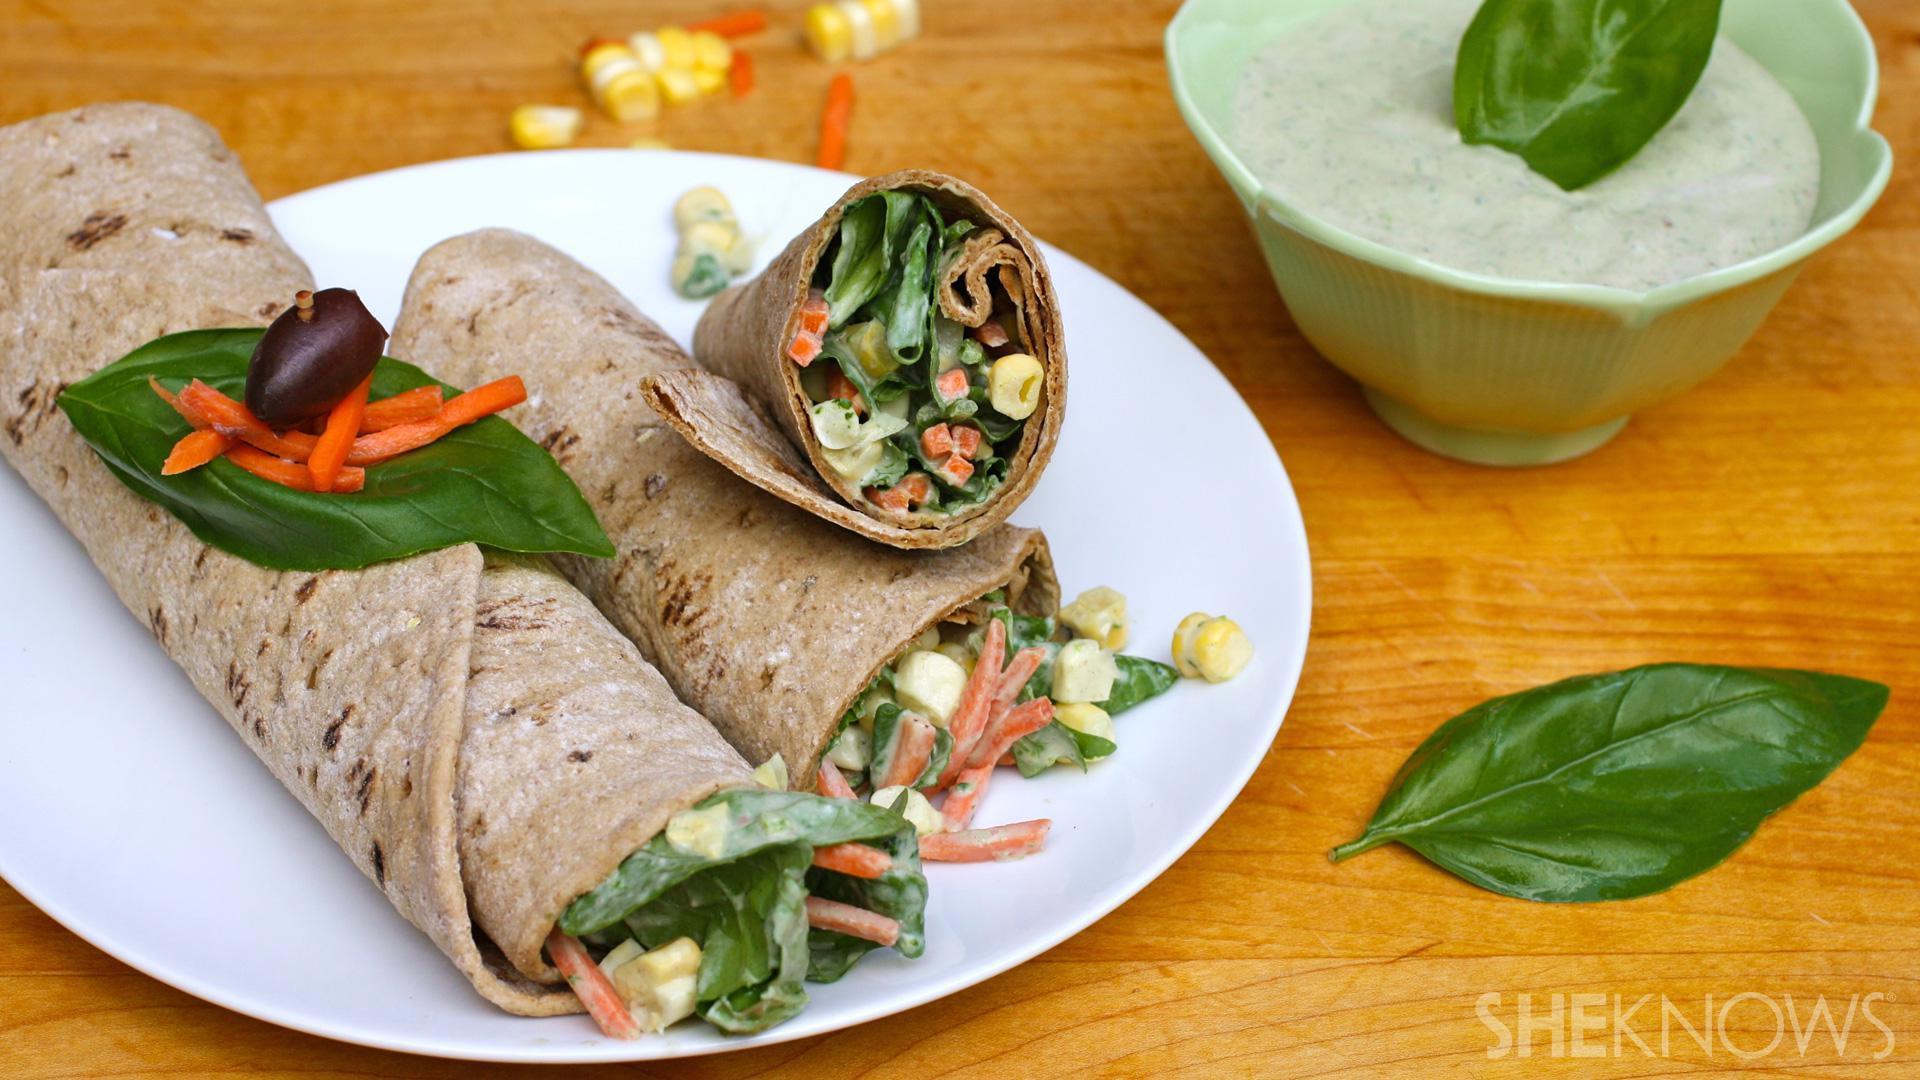 Meatless Monday: Green goddess salad wraps